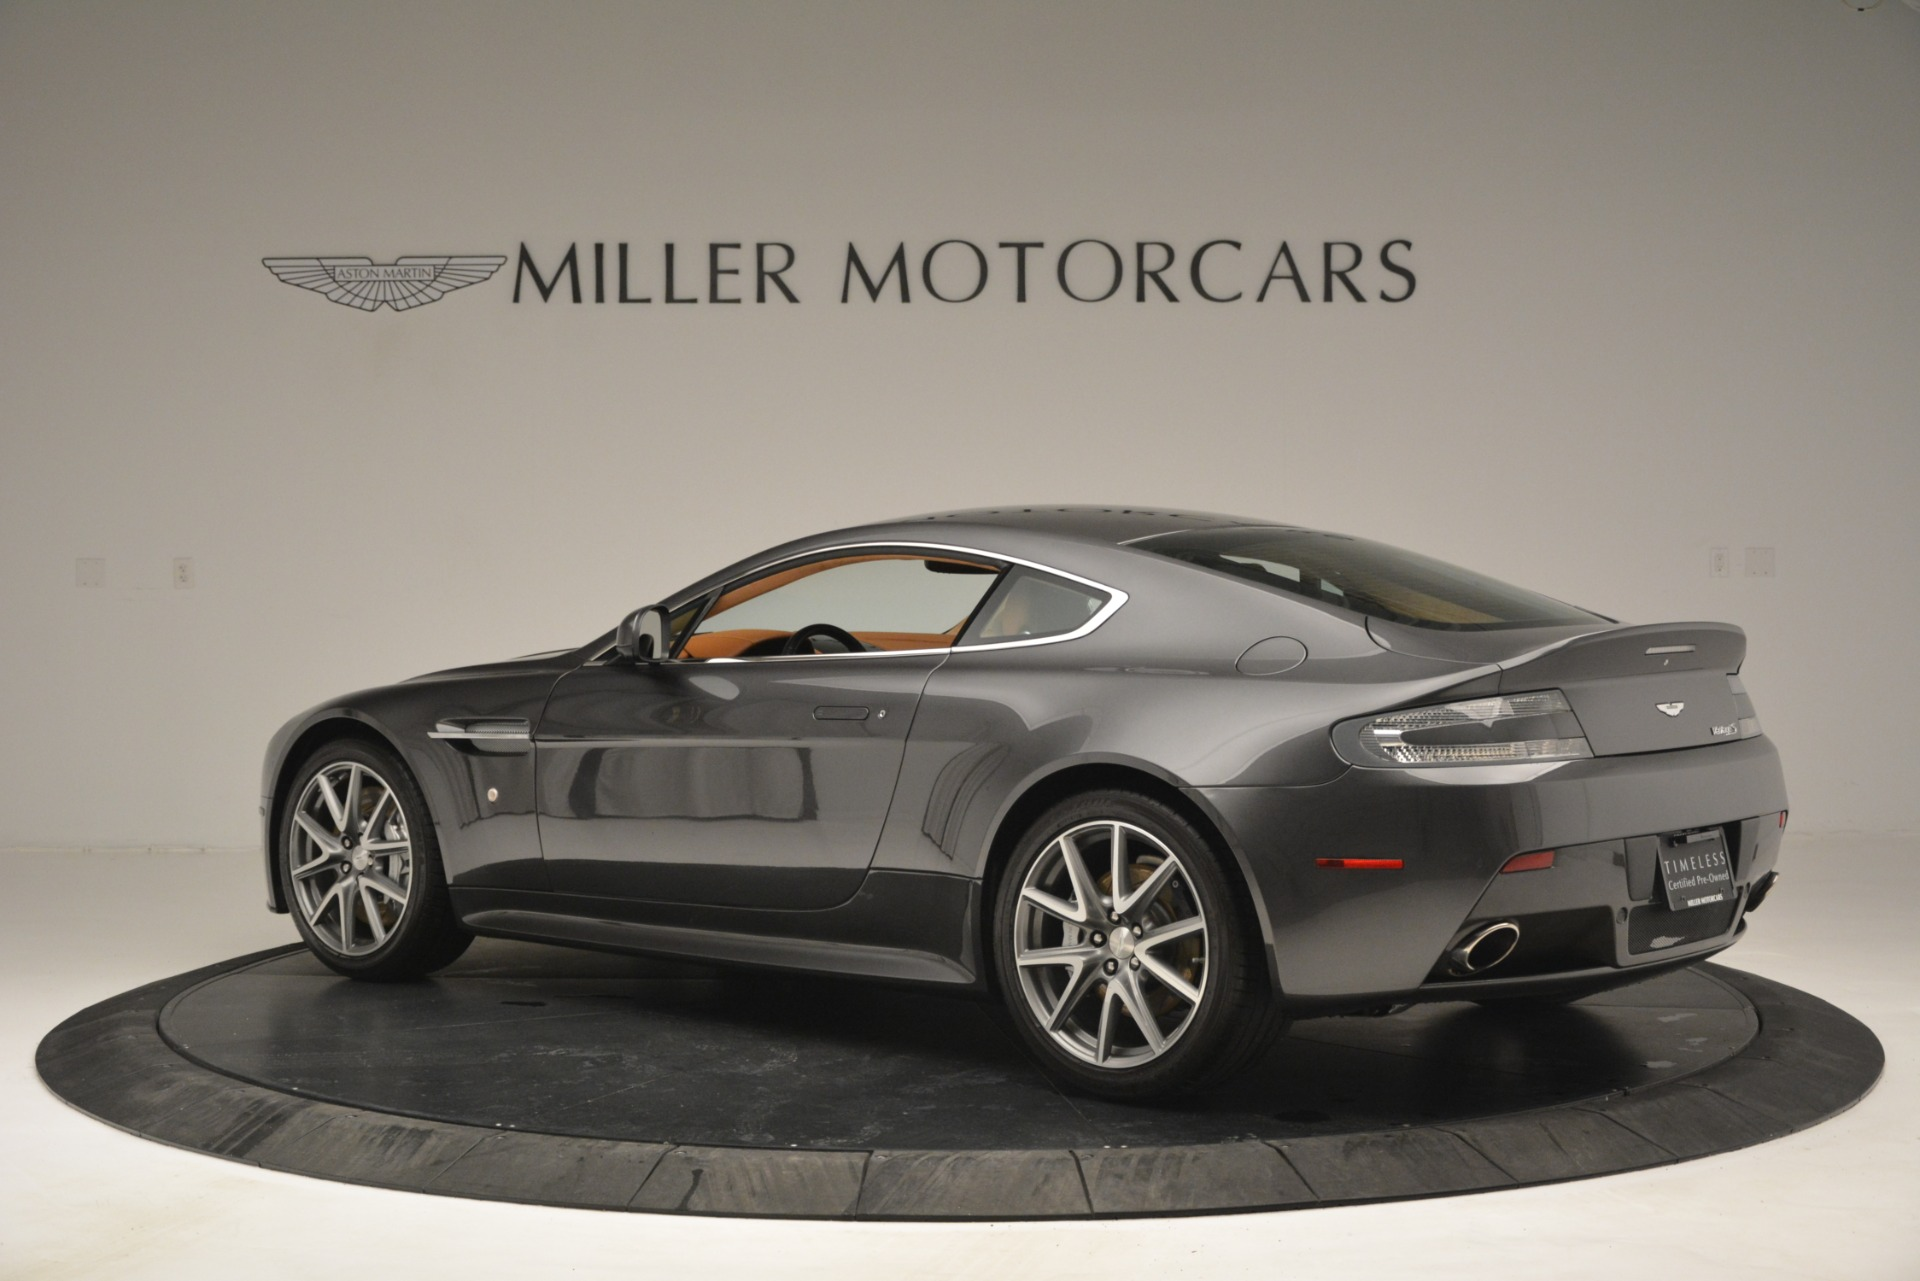 Pre Owned 2012 Aston Martin V8 Vantage S Coupe For Sale Miller Motorcars Stock 7486